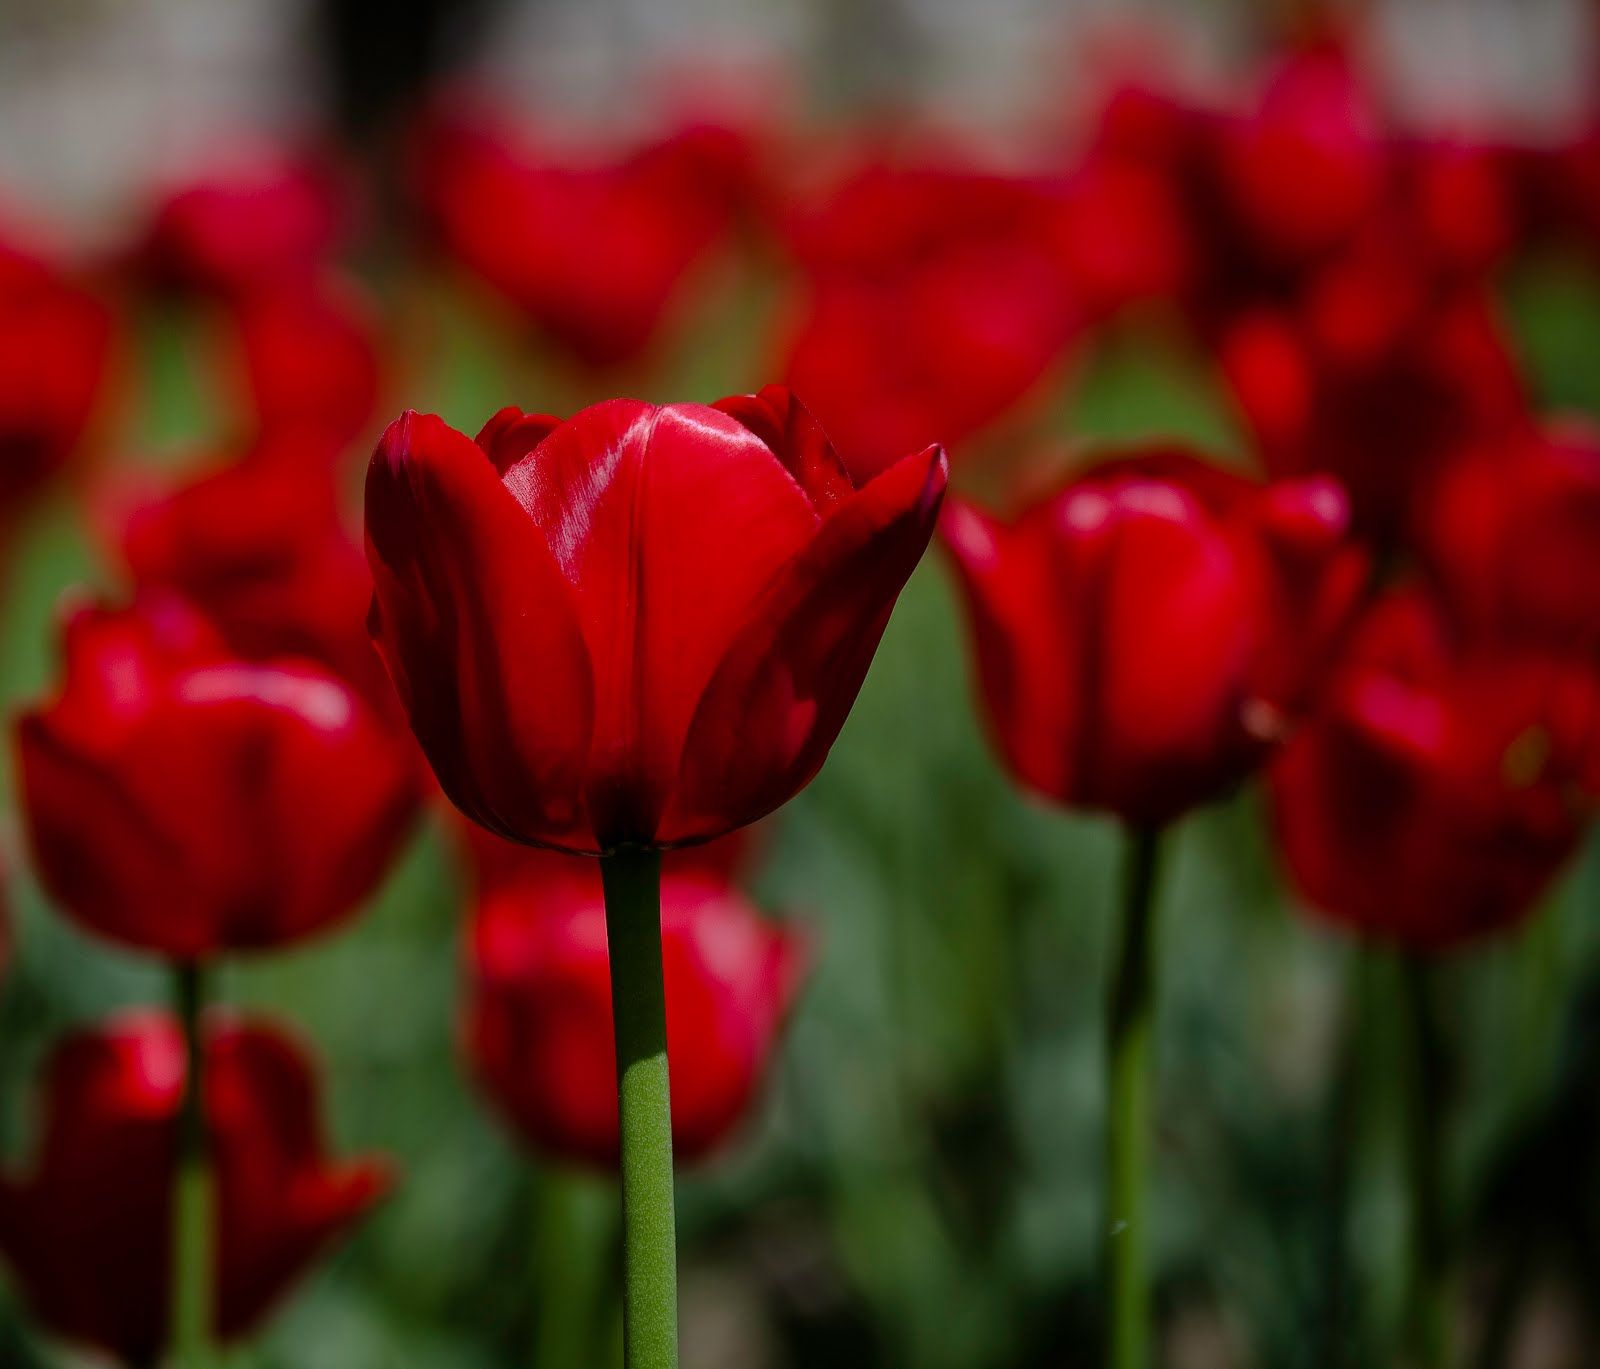 Tulip Wallpaper: Dark Red Tulips Wallpaper HD Wallpaper